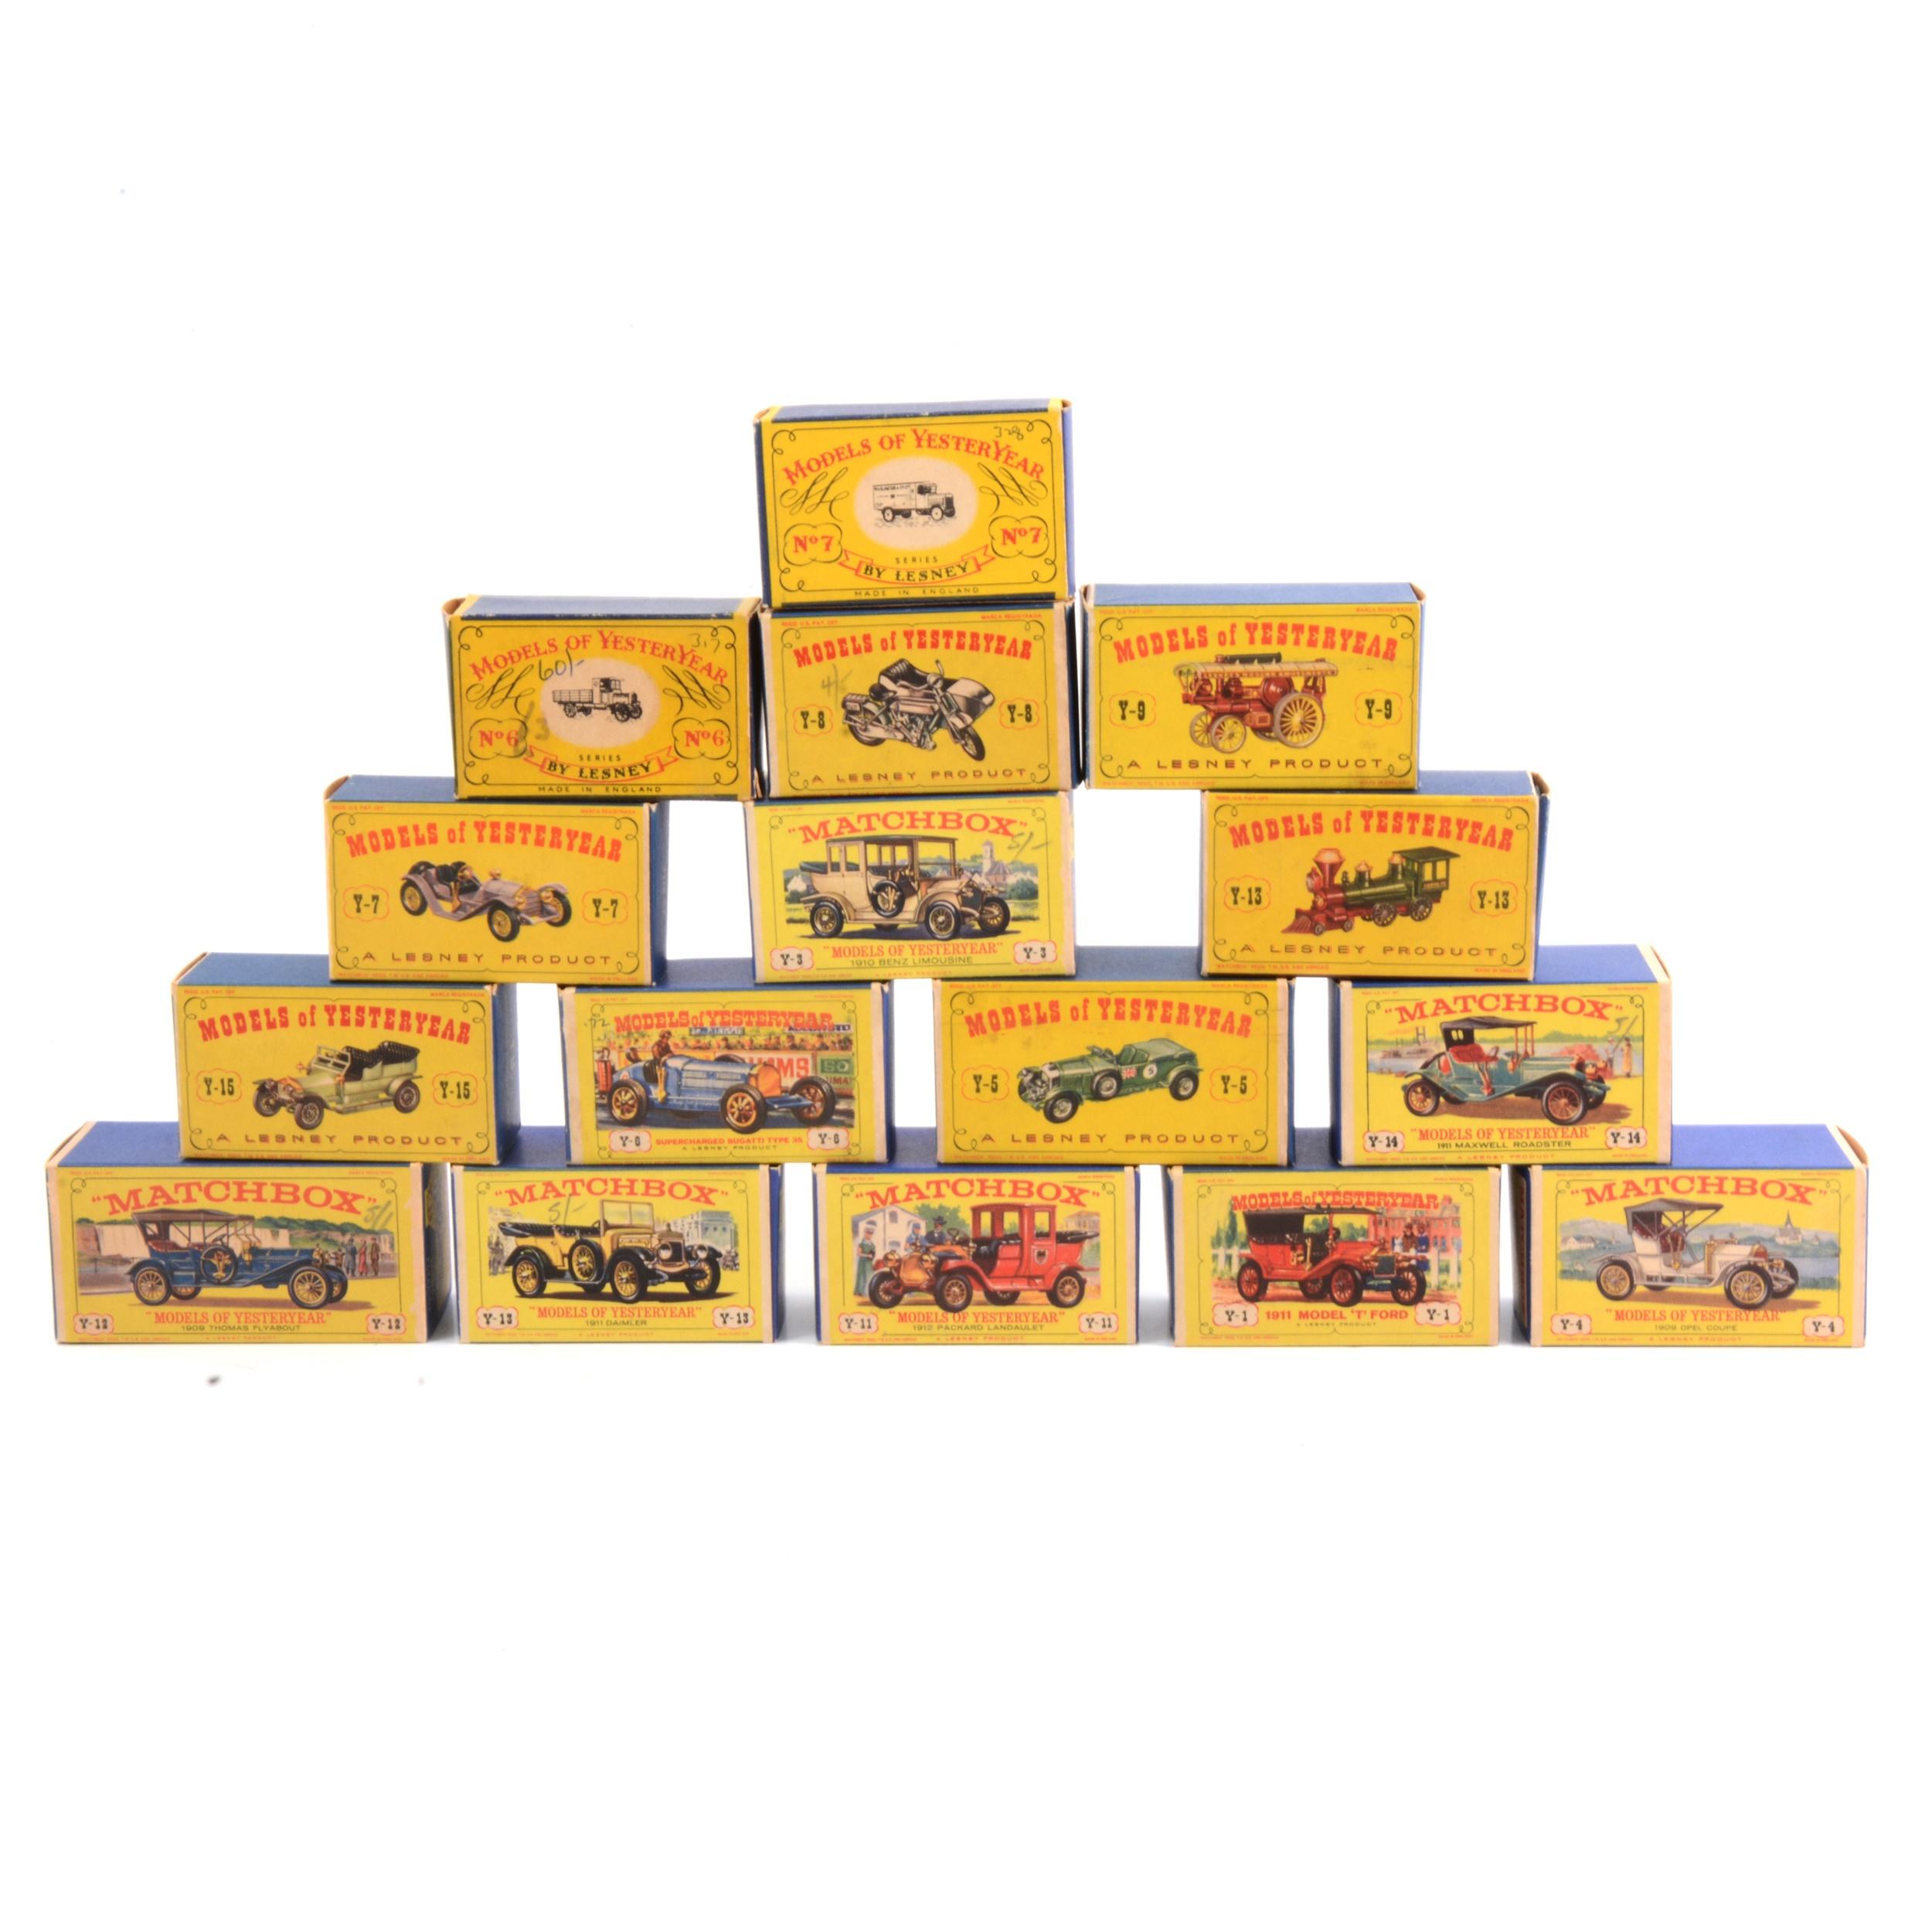 Matchbox Model of Yesteryear models, sixteen boxed models.